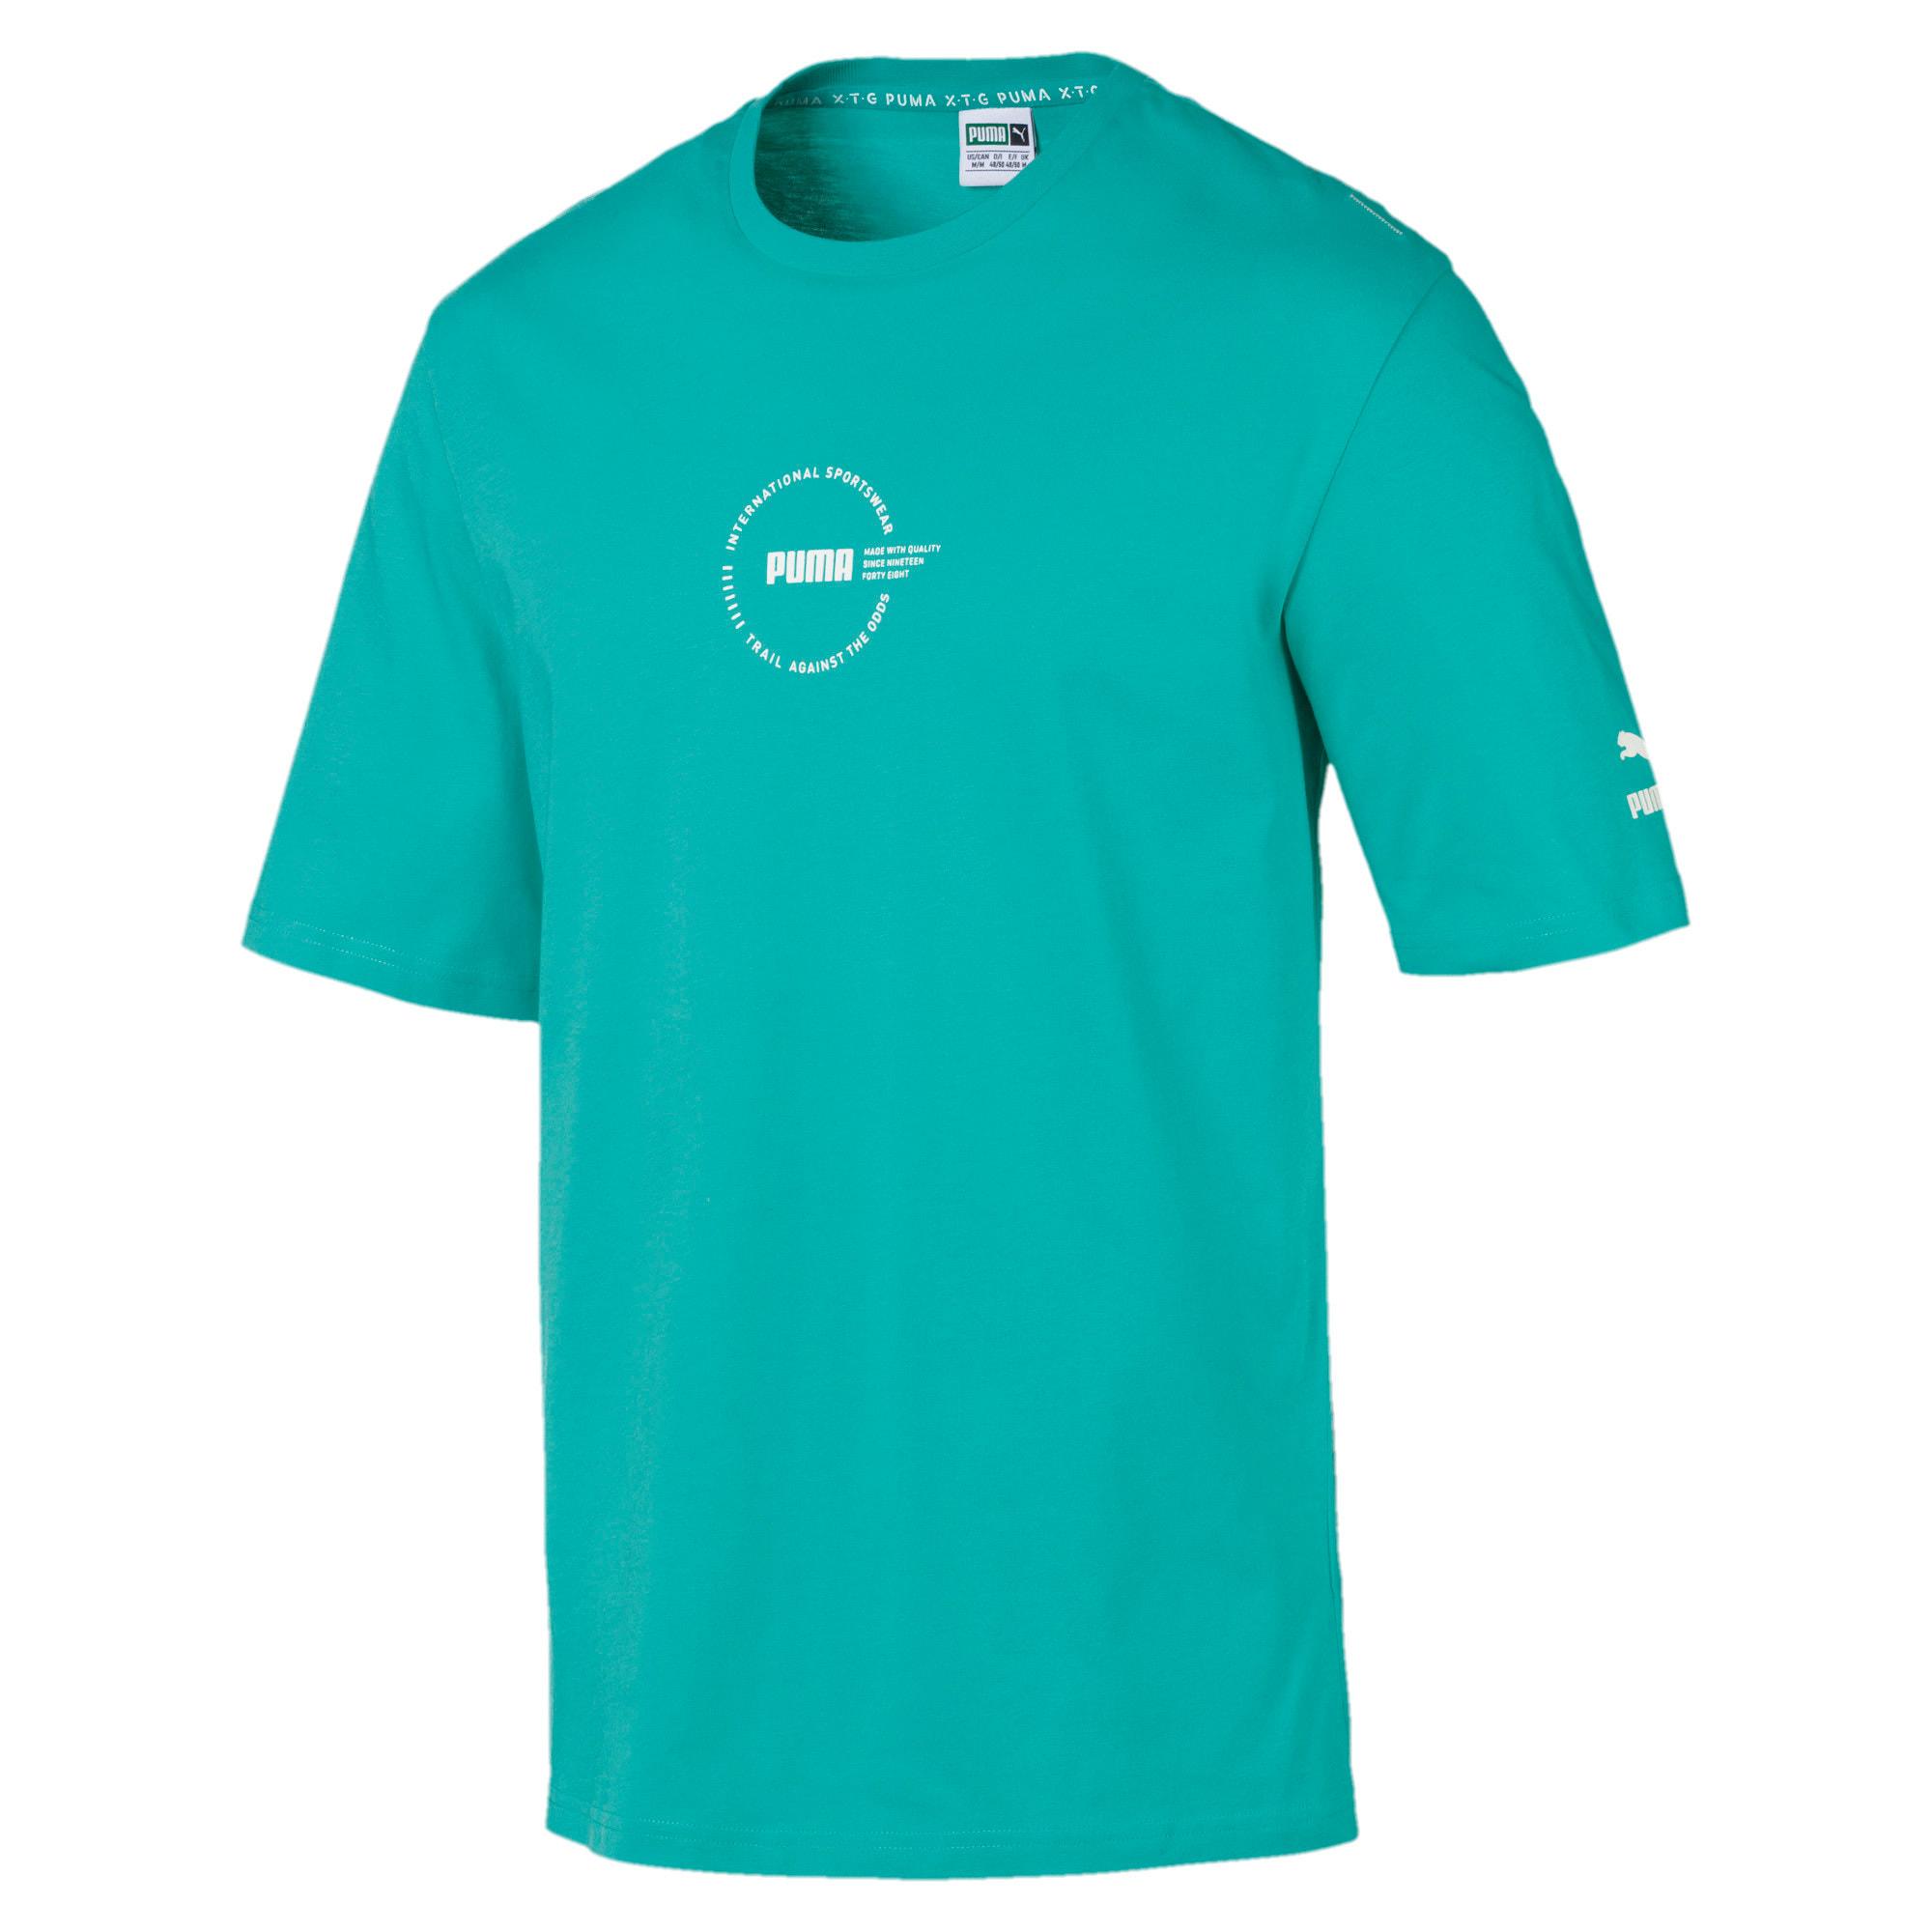 Thumbnail 1 of XTG Trail Graphic Short Sleeve Men's Tee, Blue Turquoise, medium